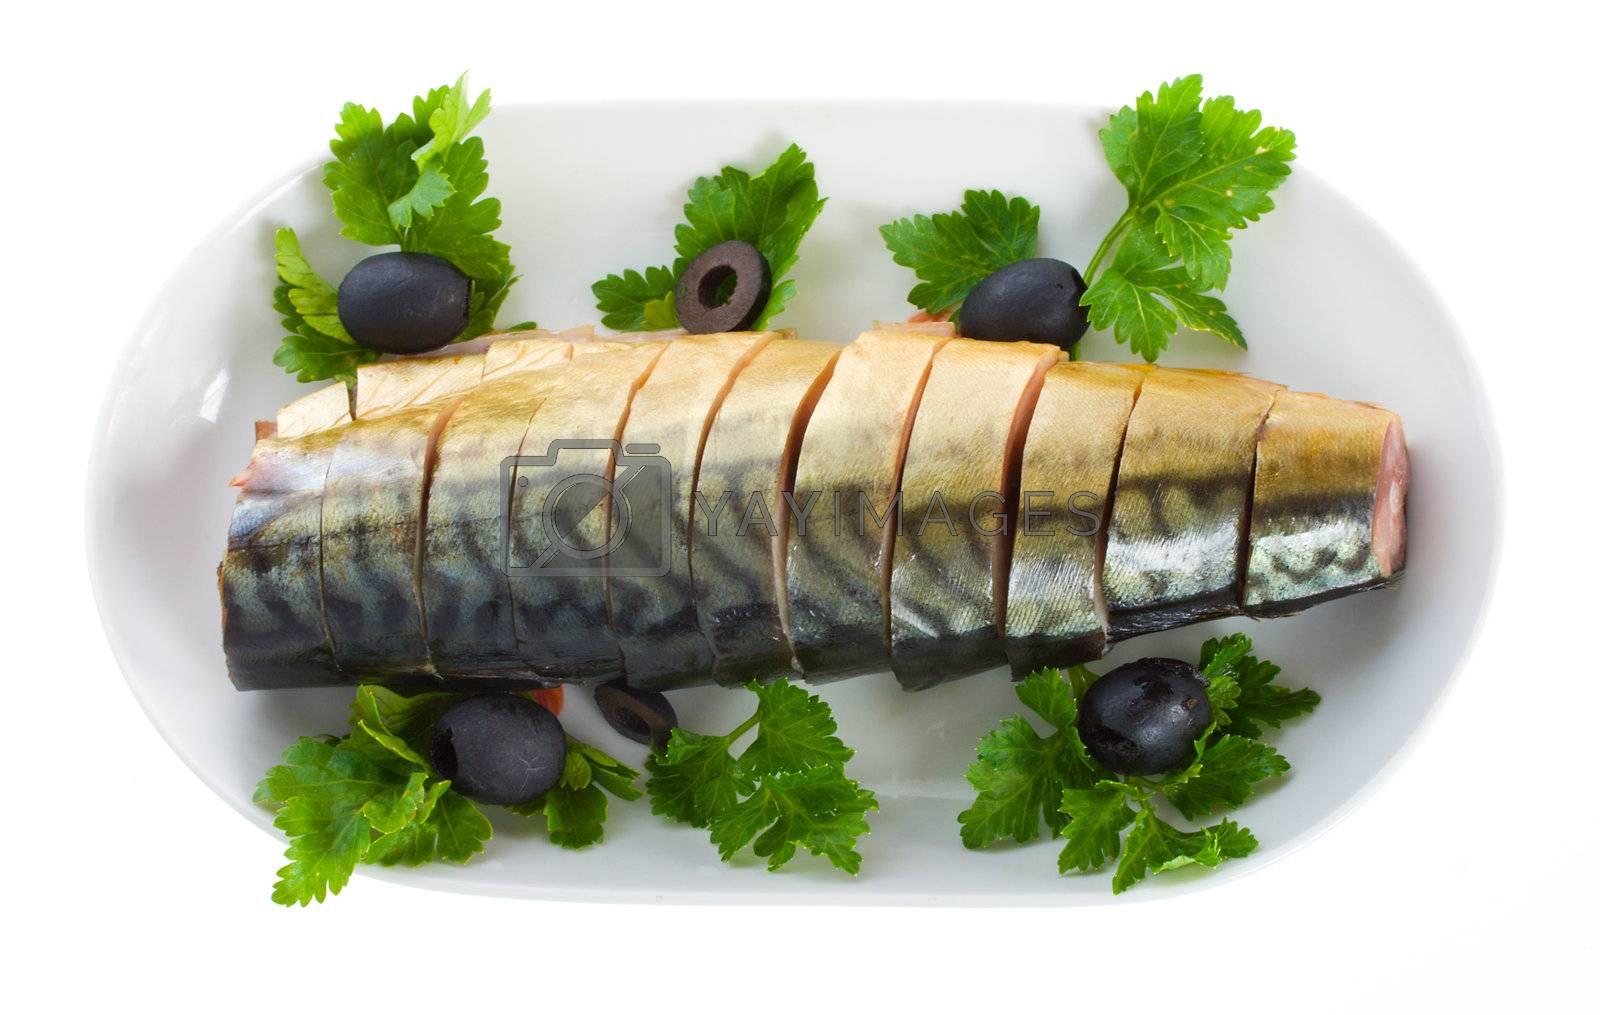 mackerel on plate, isolated